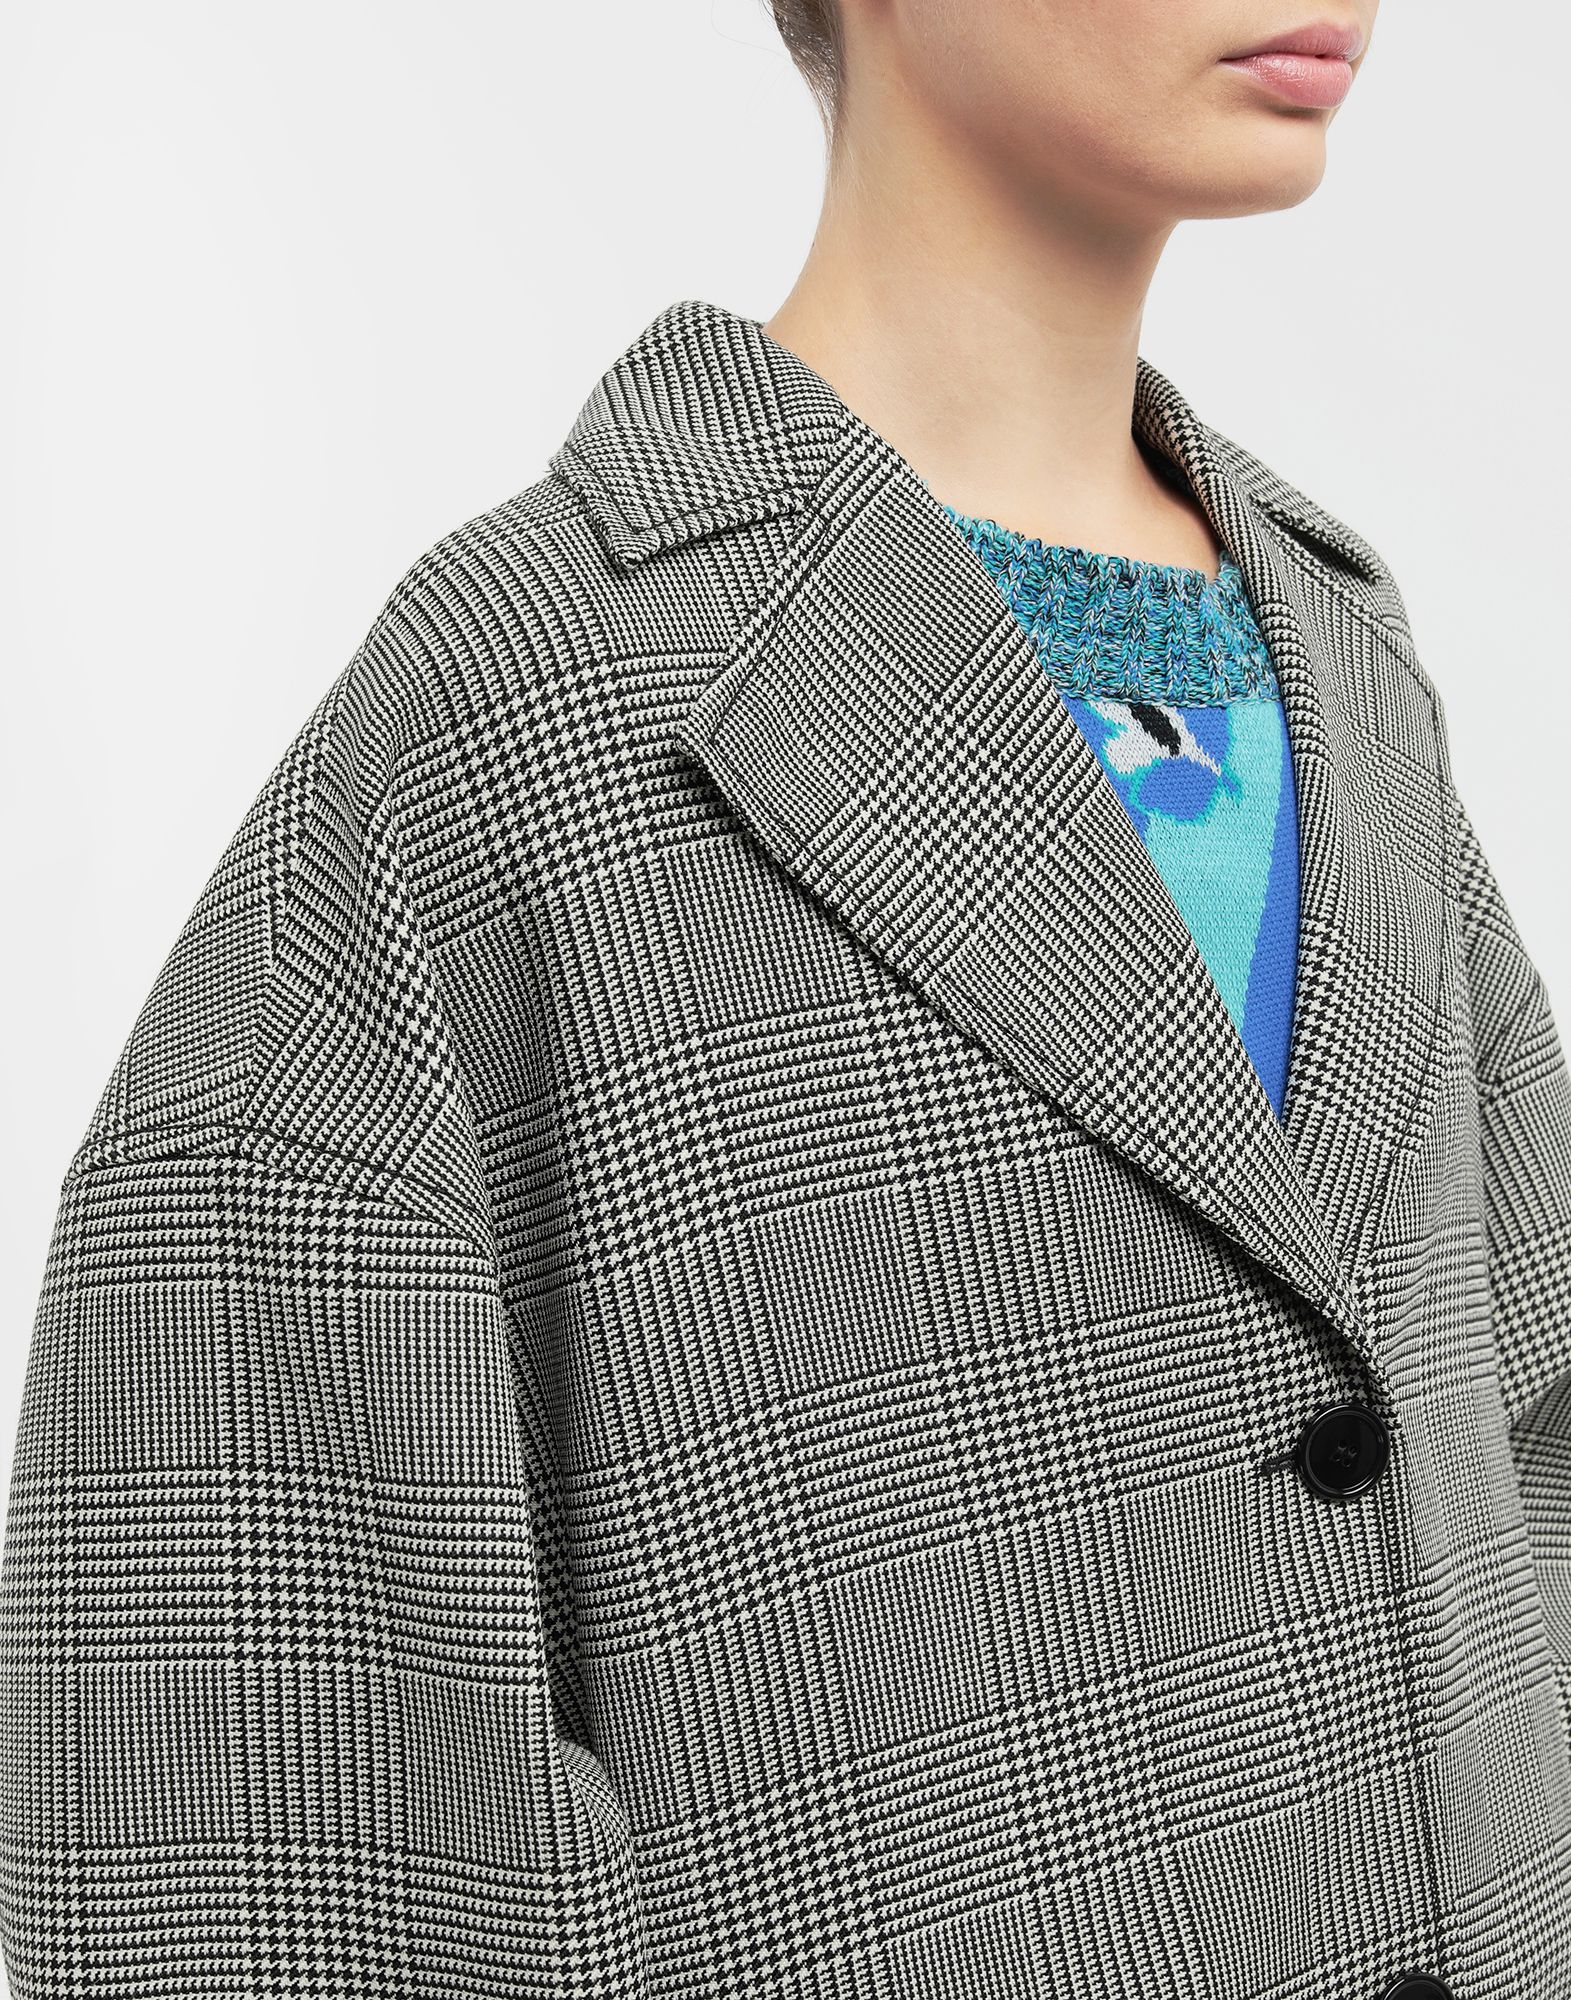 MM6 MAISON MARGIELA Oversized checked coat Coat Woman a